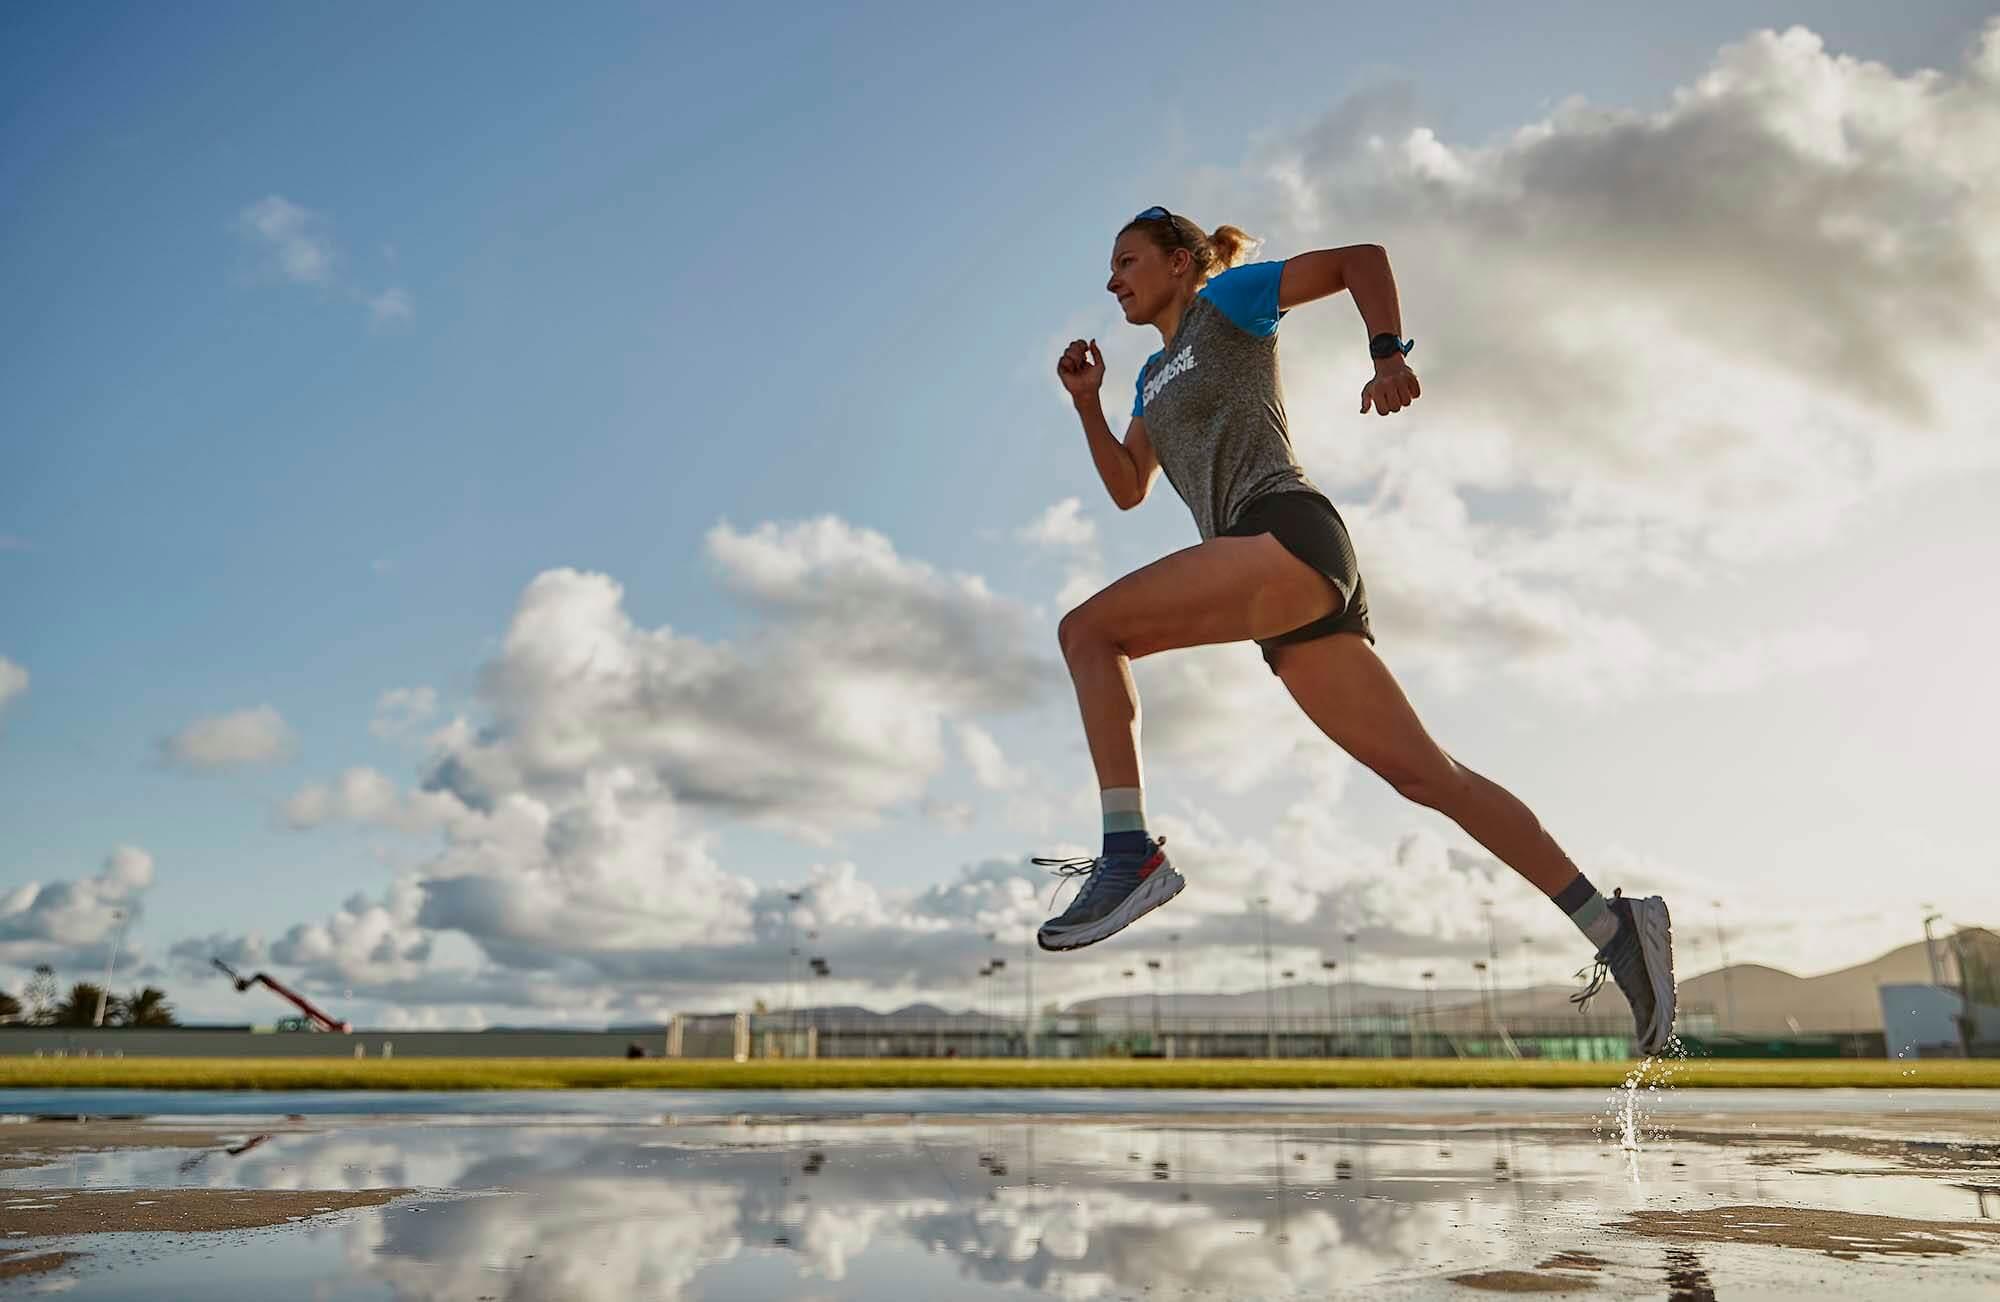 HOKA athlete Carolin Lehrieder runs across the wet ground